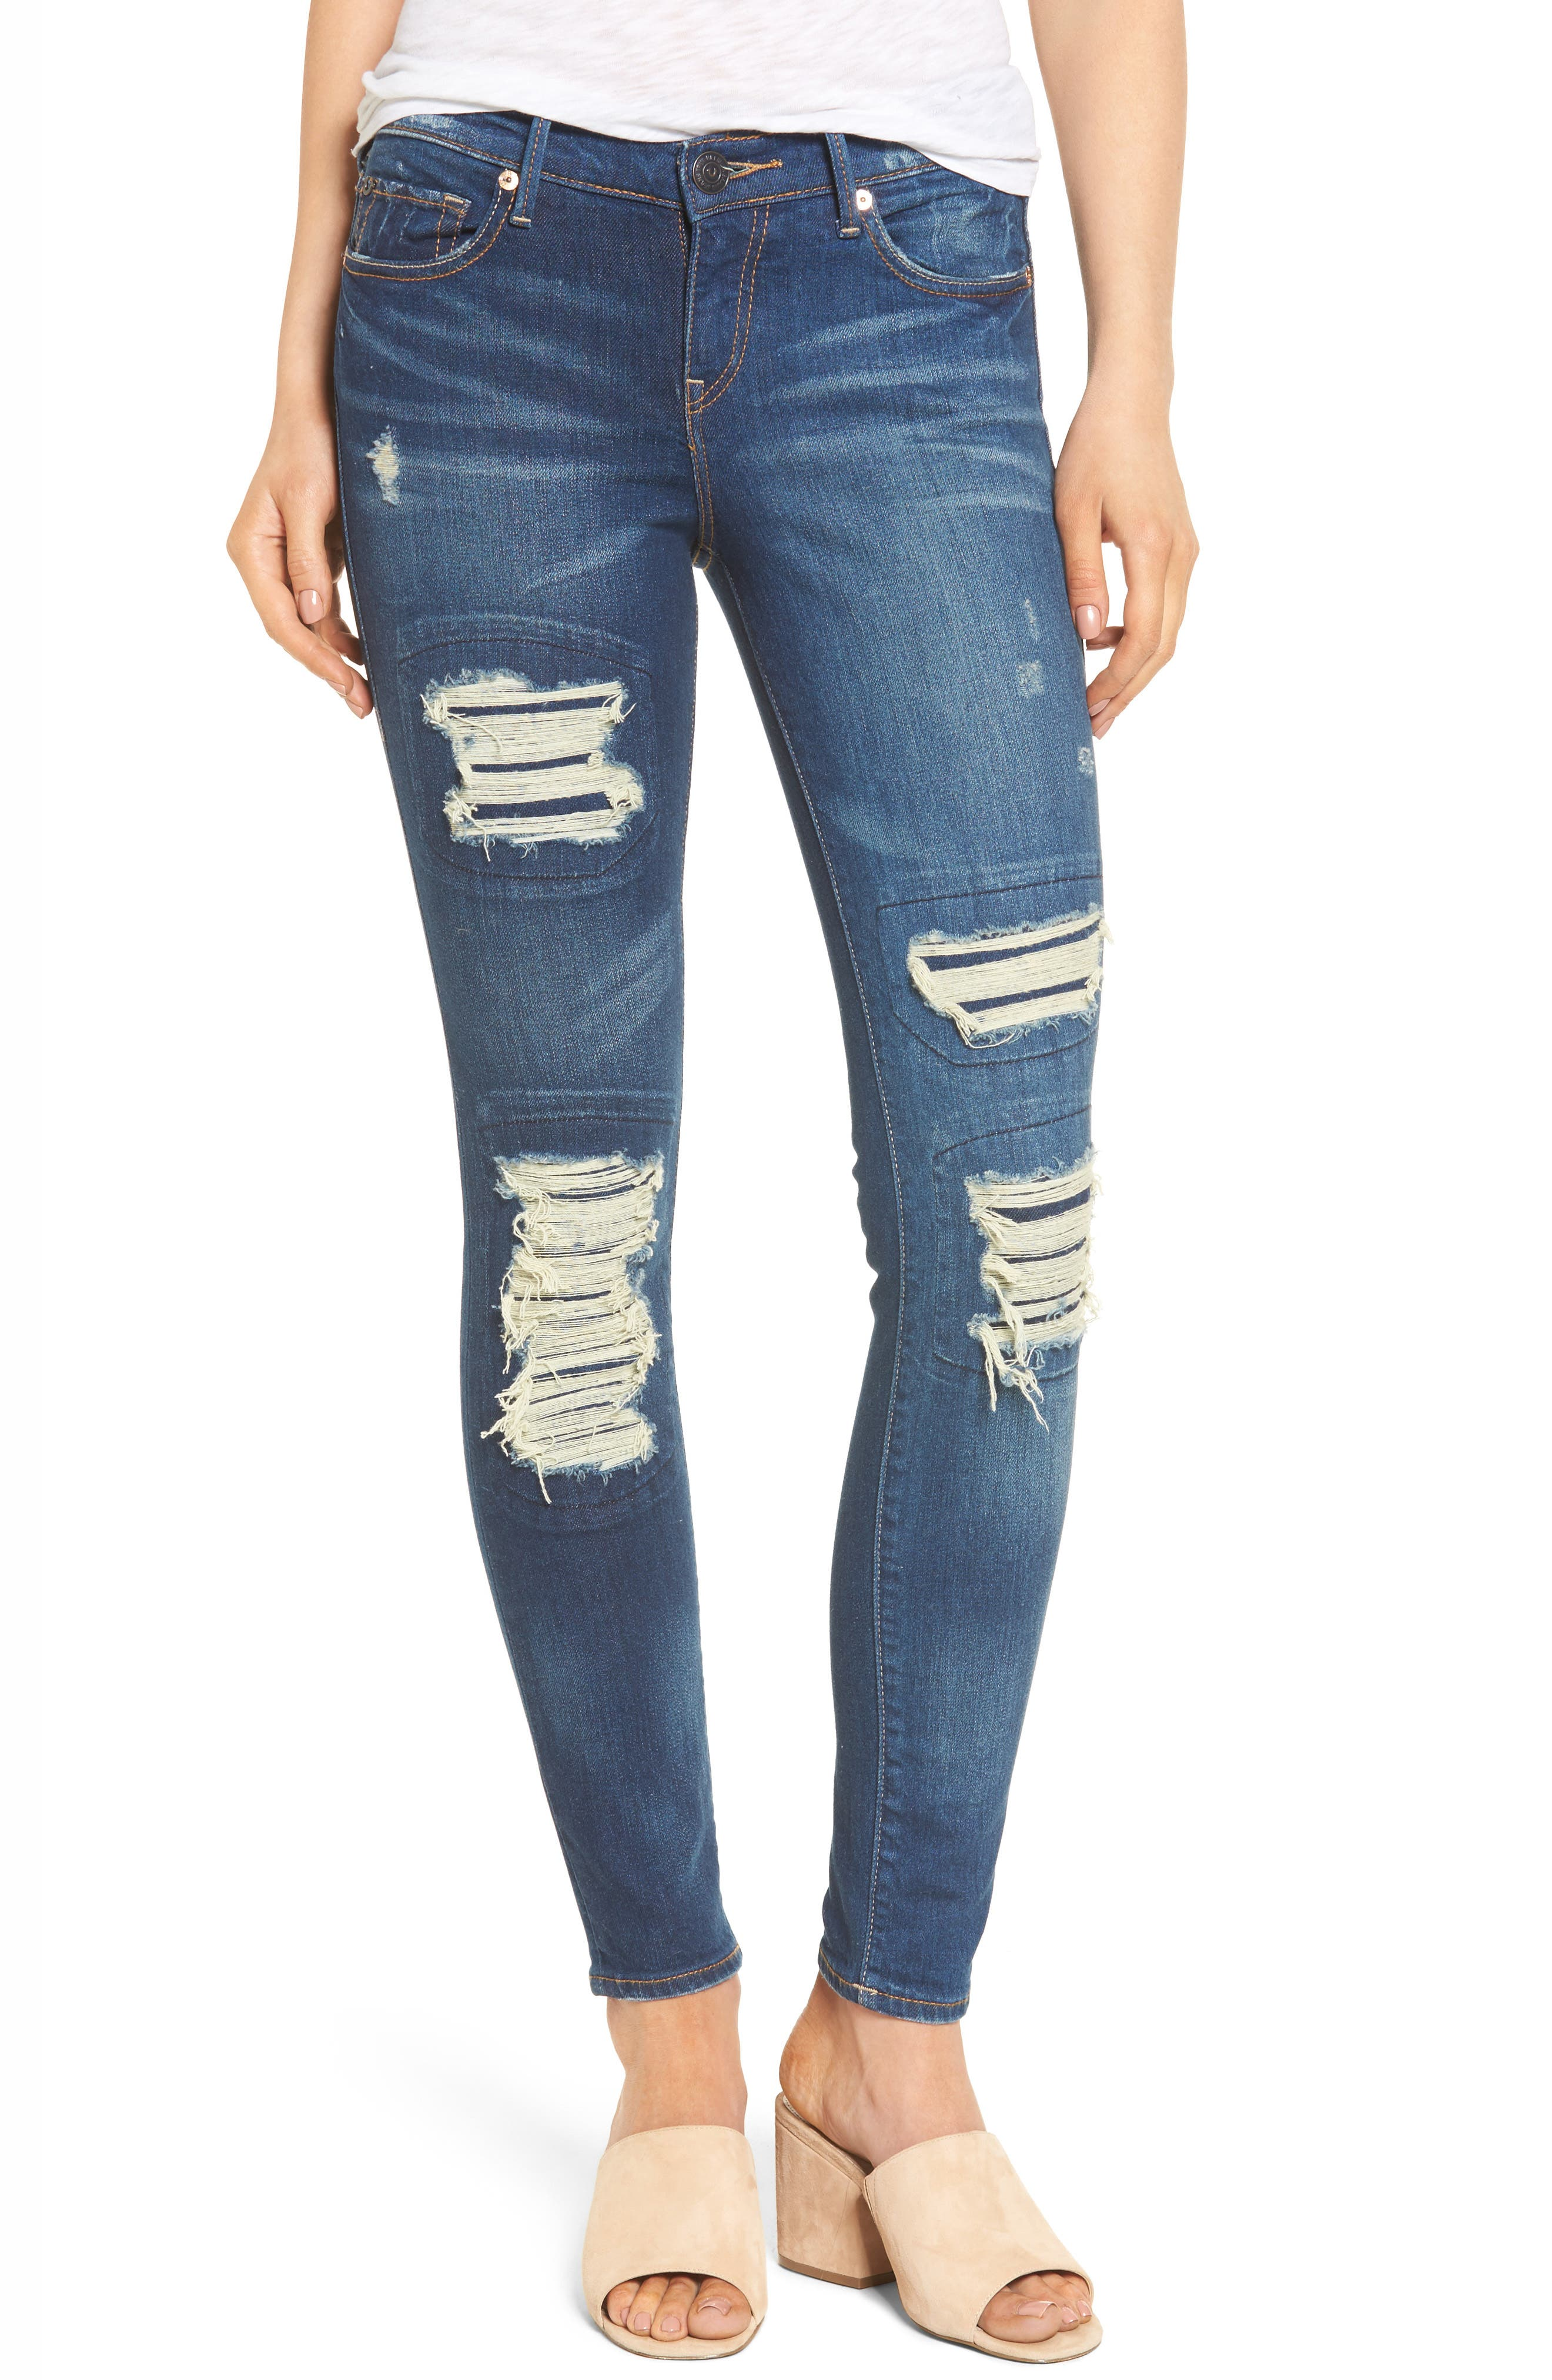 Main Image - True Religion Brand Jeans Halle Super Skinny Jeans (Indigo Cadence)